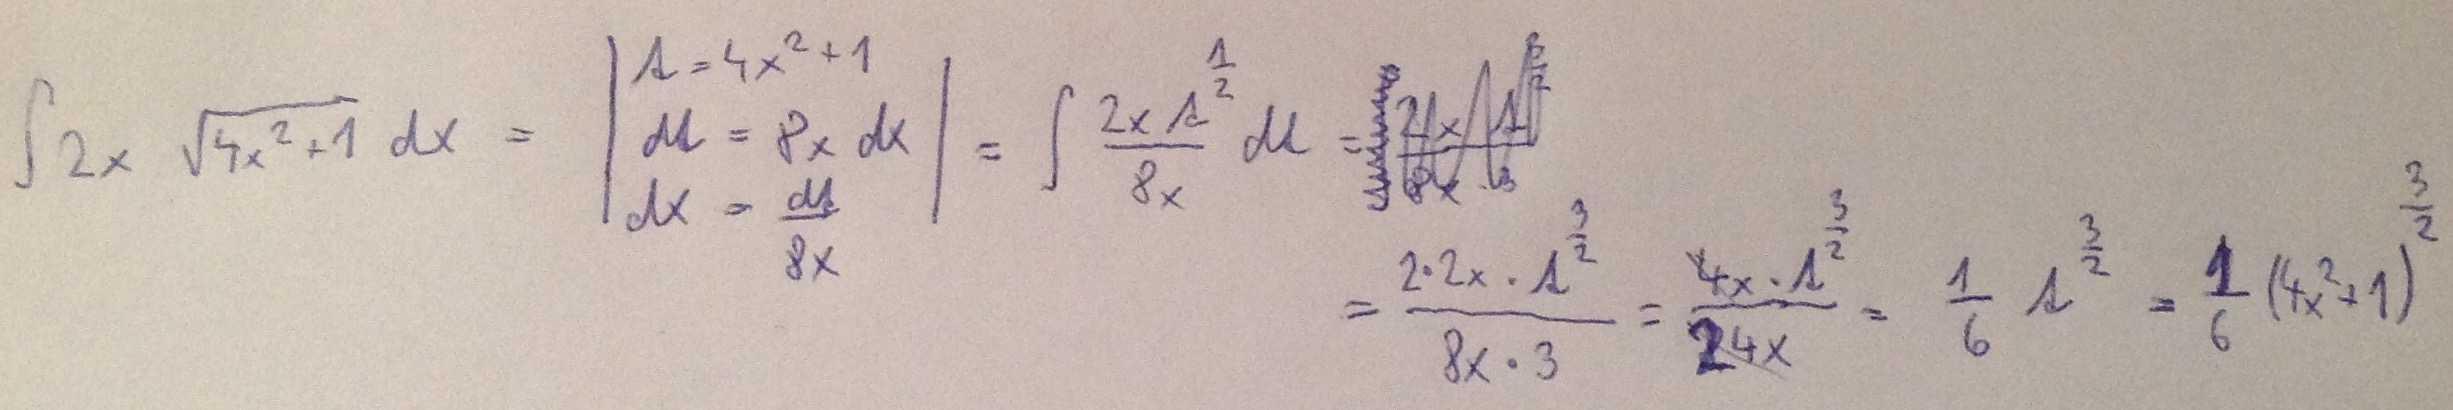 http://forum.matematika.cz/upload3/img/2018-01/97389_IMG_2073.JPG